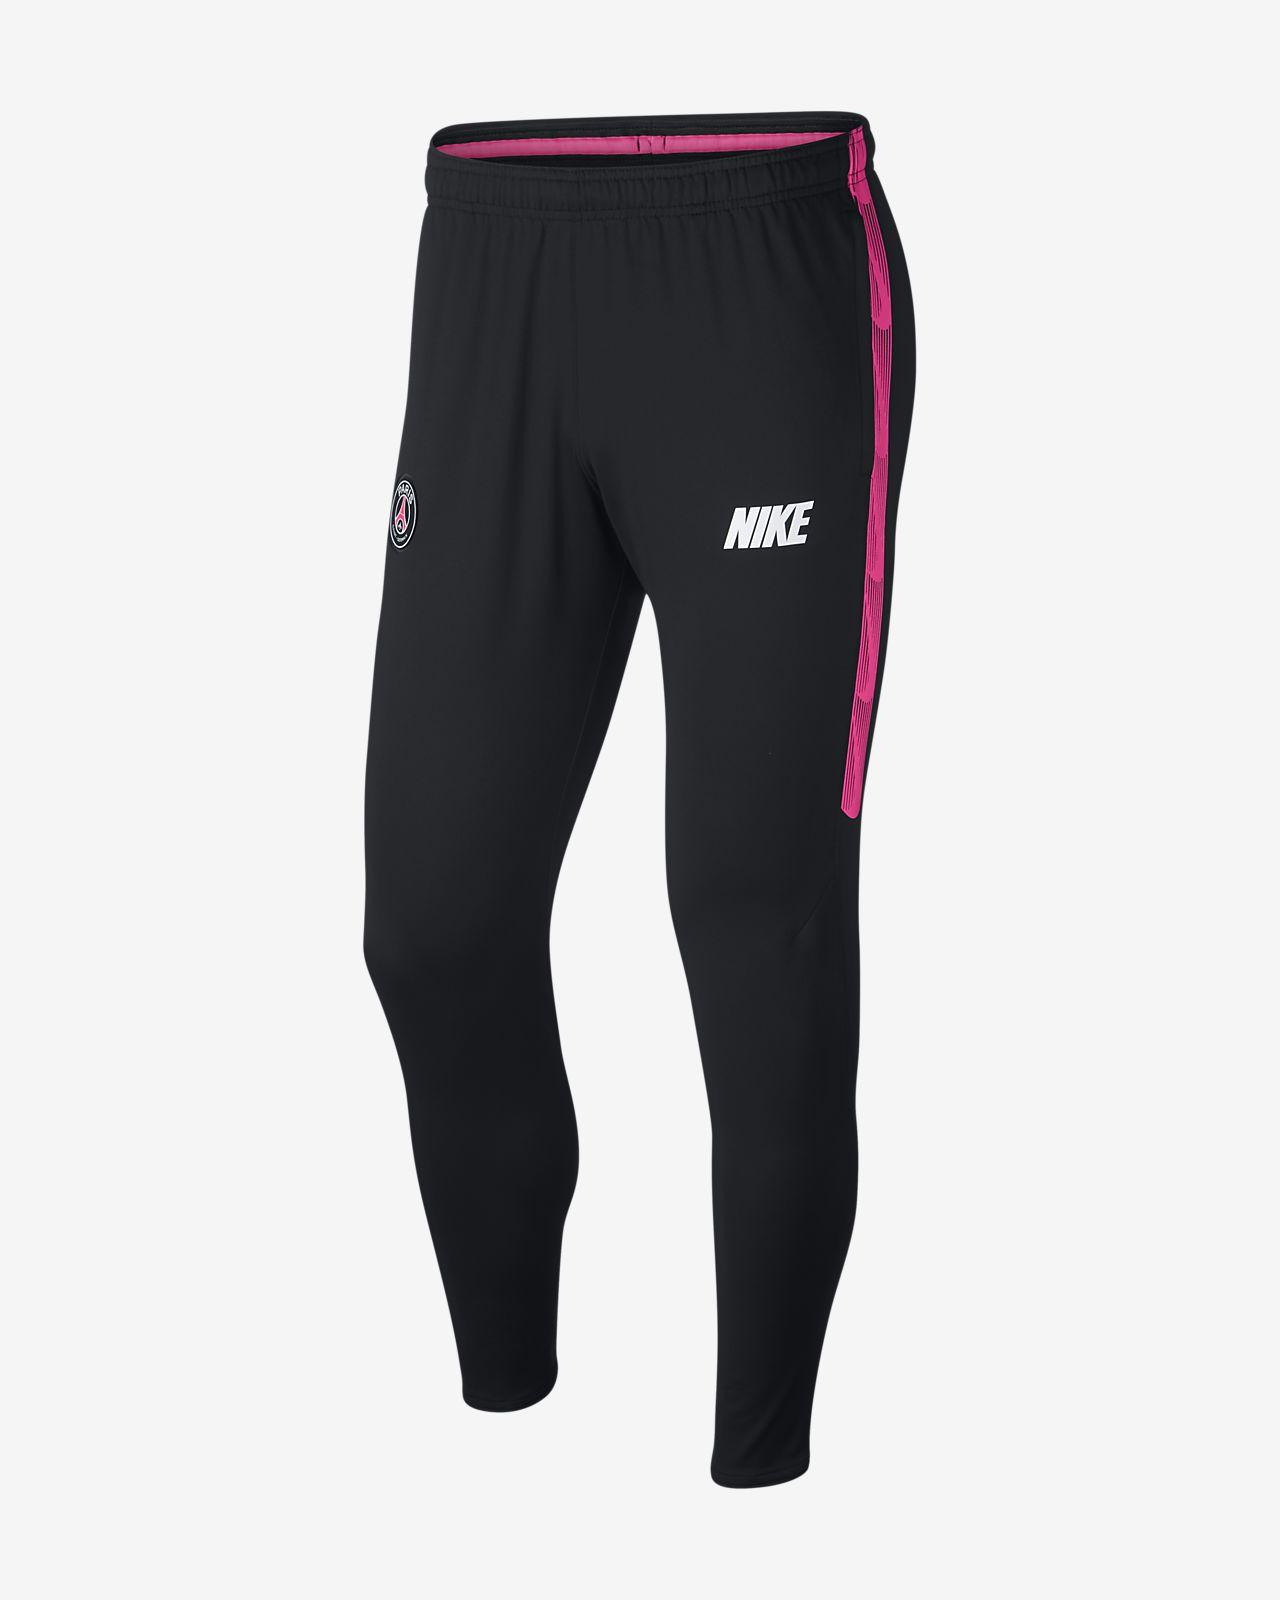 Pantalones de fútbol para hombre Paris Saint-Germain Dri-FIT Squad